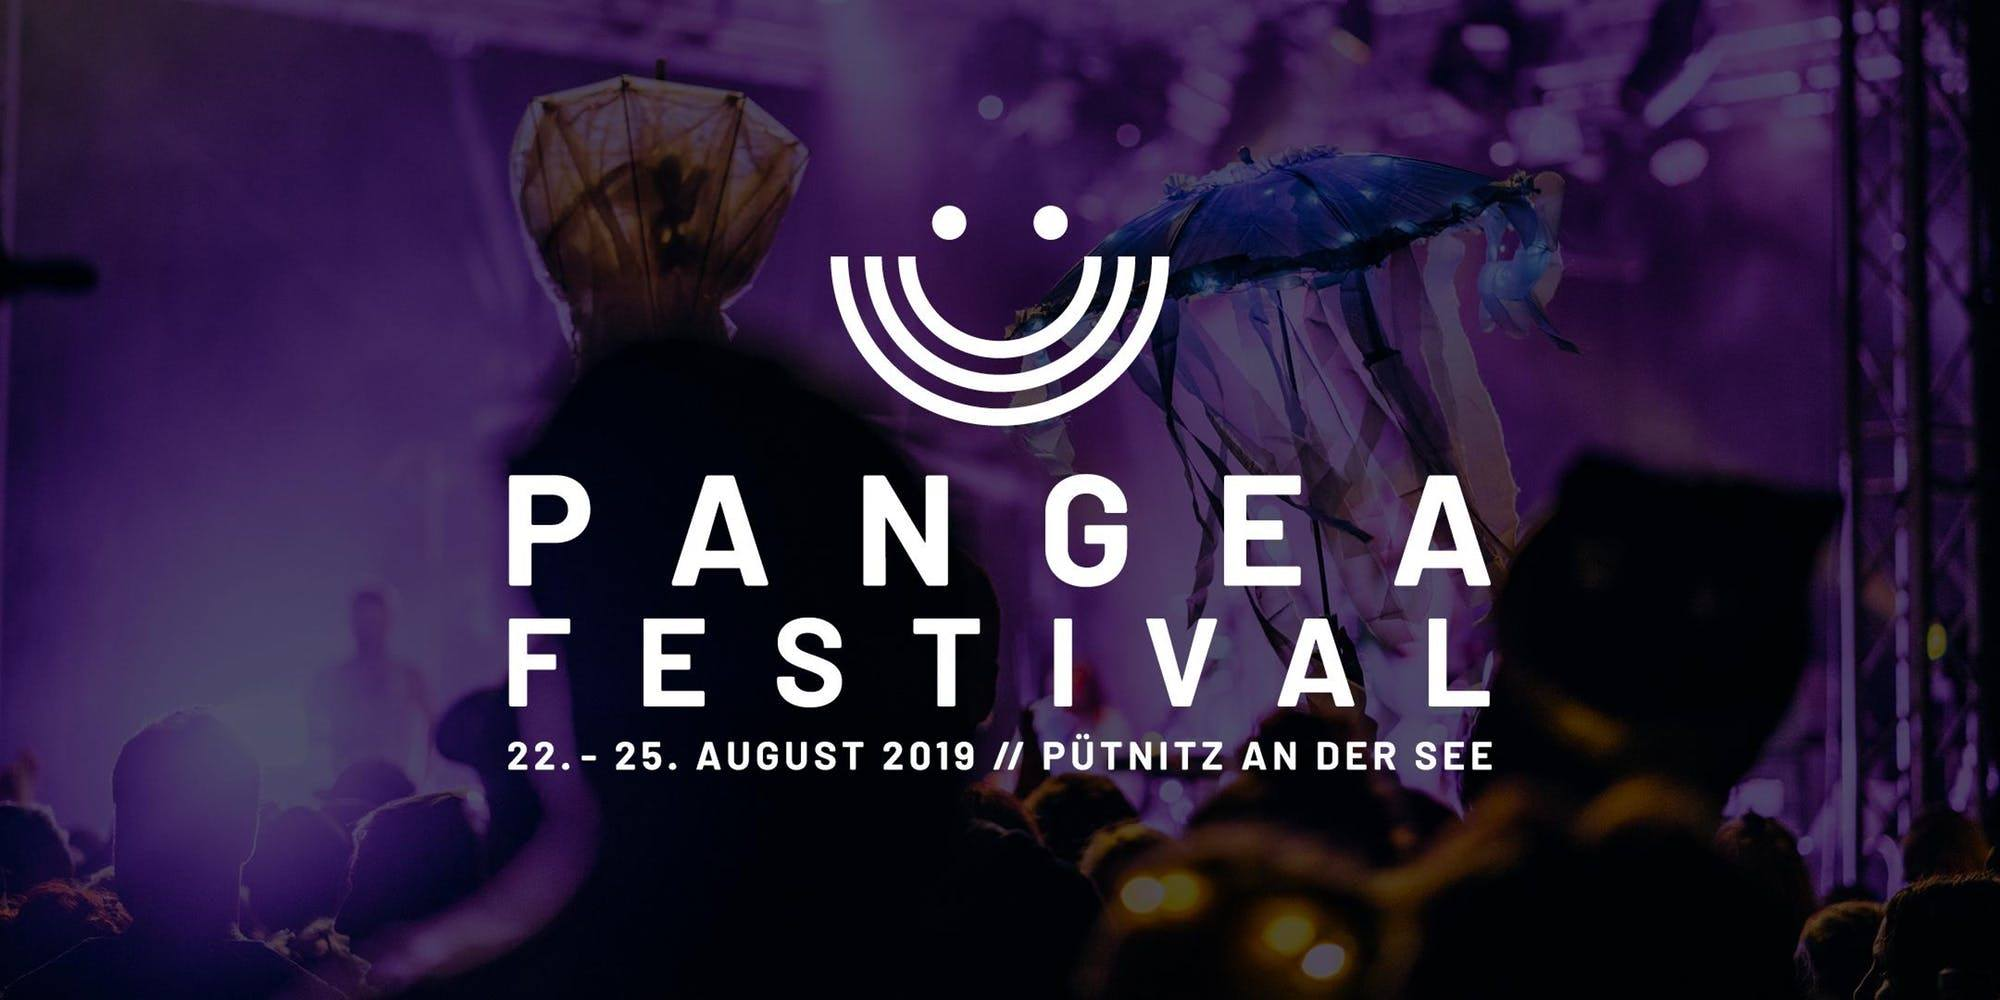 Pangea Festival 2019